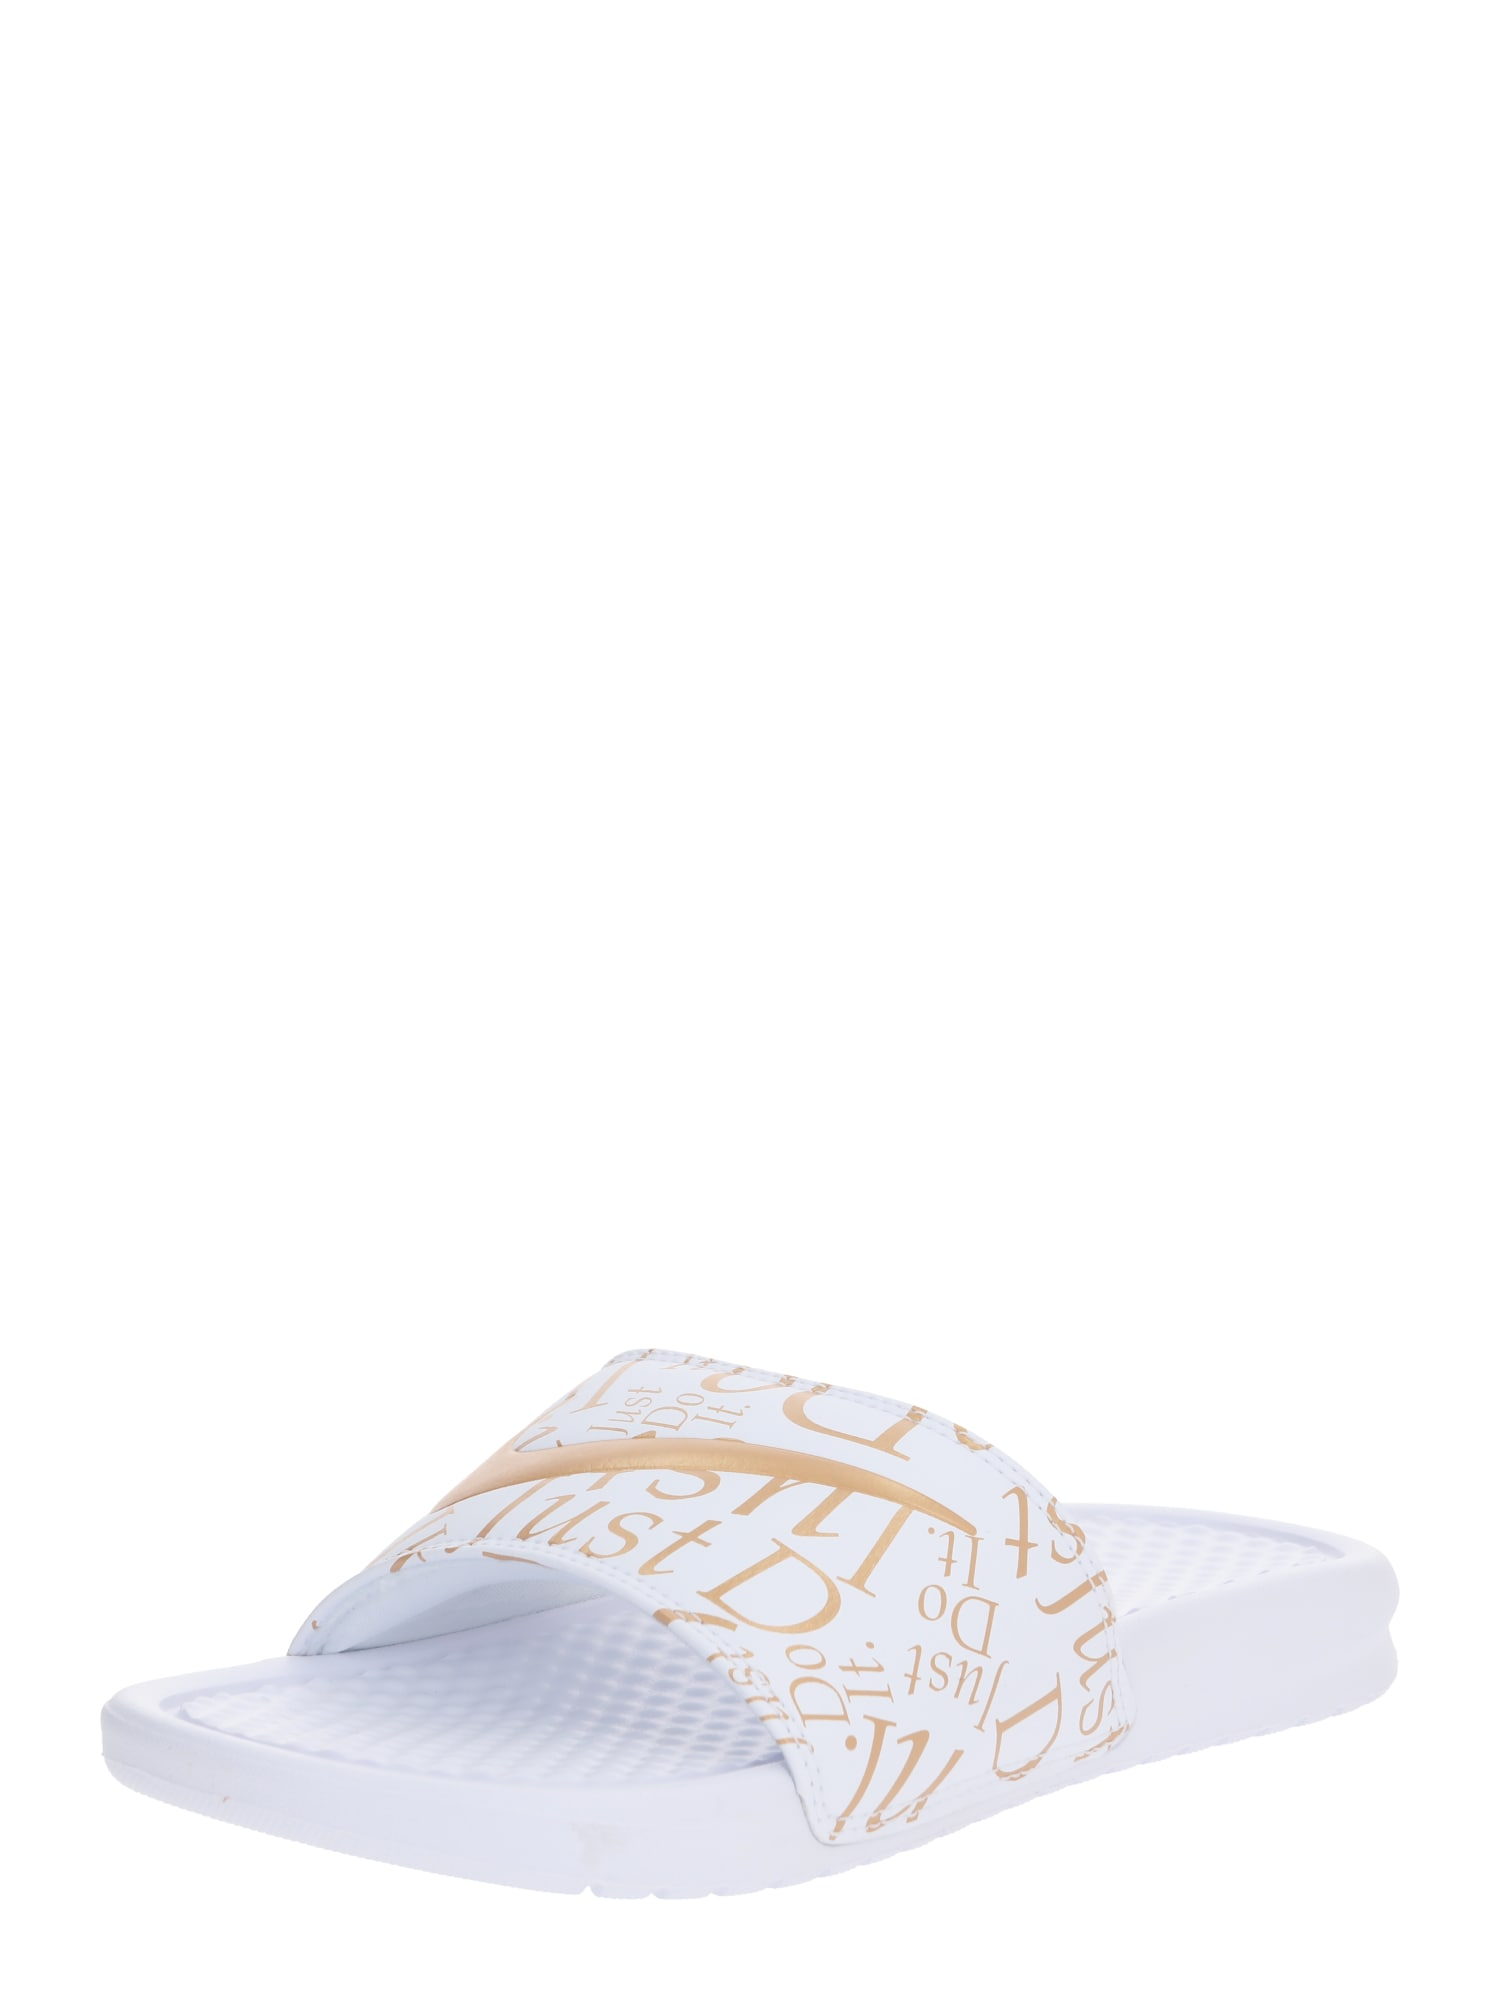 Nike Sportswear Šlepetės 'Wmns Benassi Just do it' balta / auksas